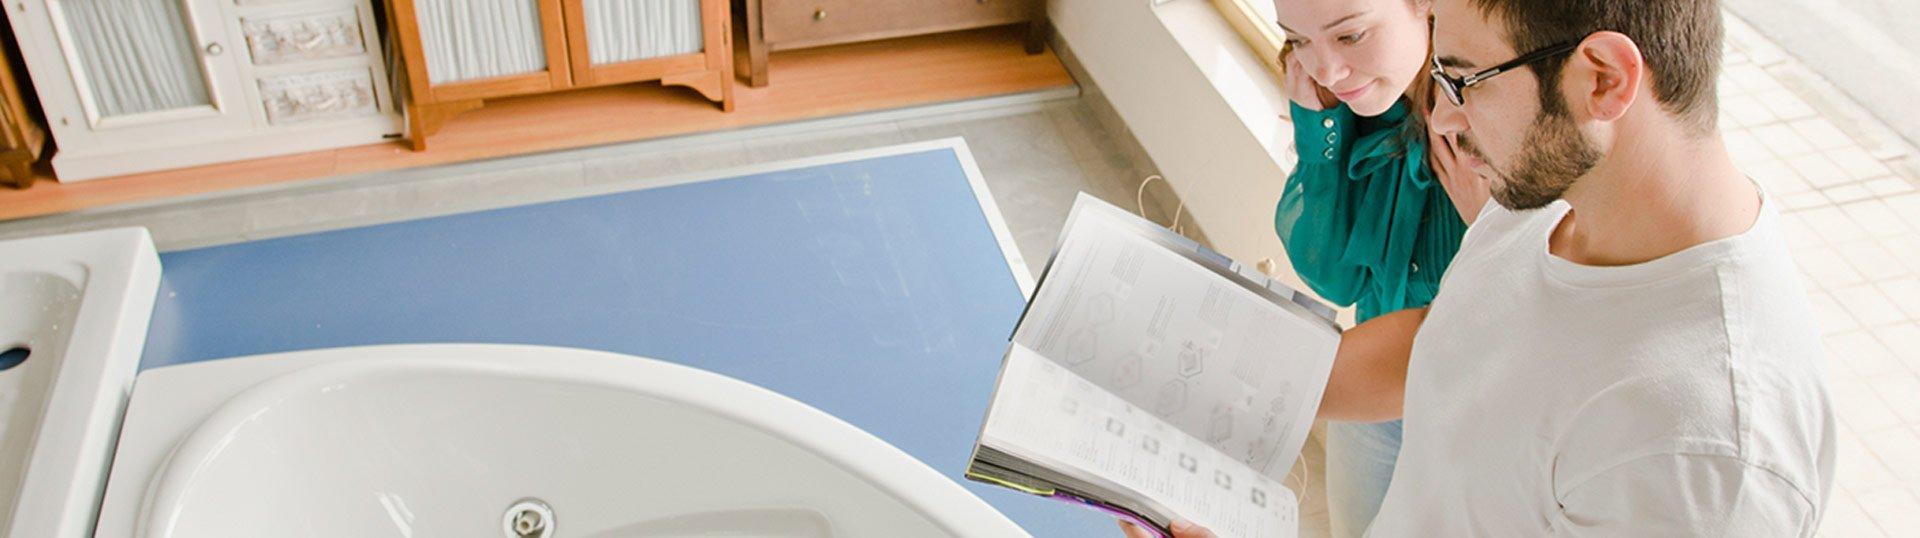 allpoints bathroom services tiled couple looking catalog of bath tub